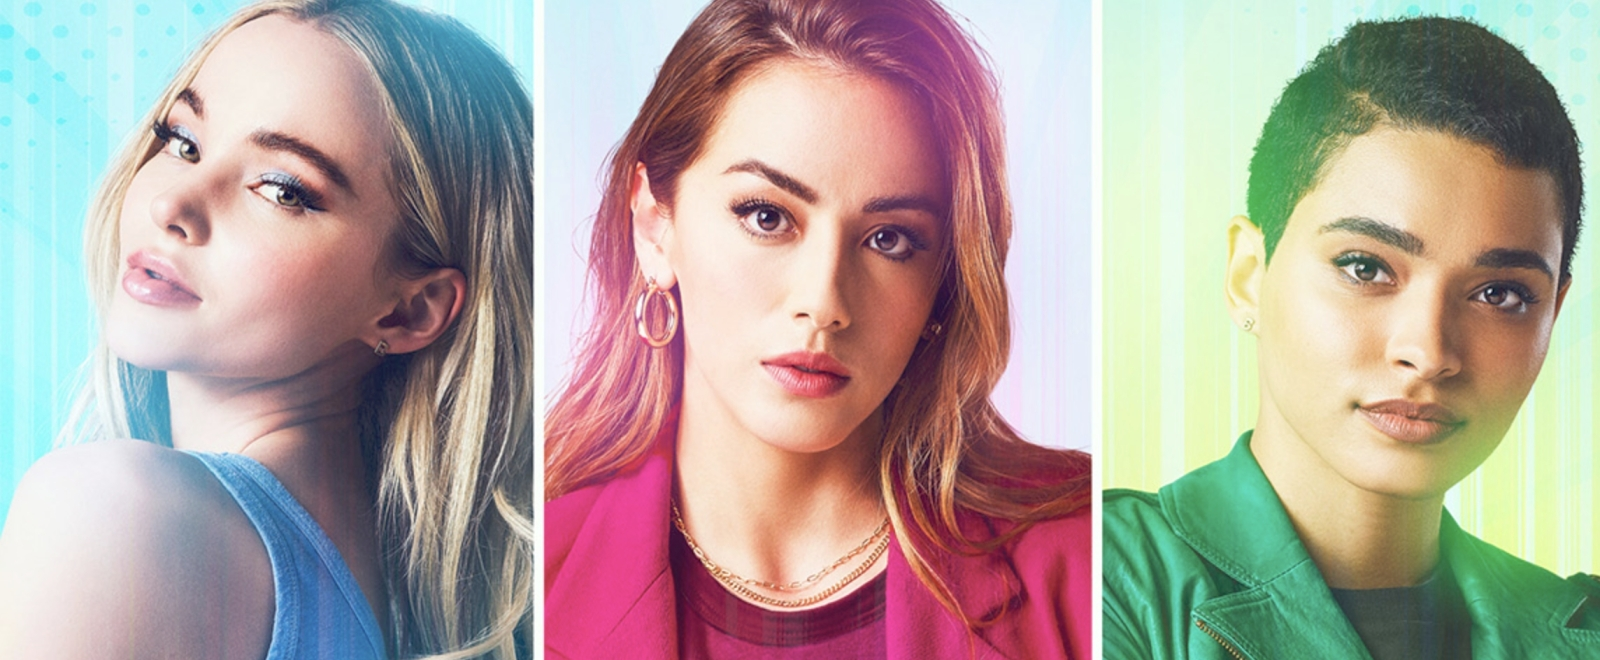 CW's Upcoming 'Powerpuff Girls' Series Loses Star Chloe Bennet